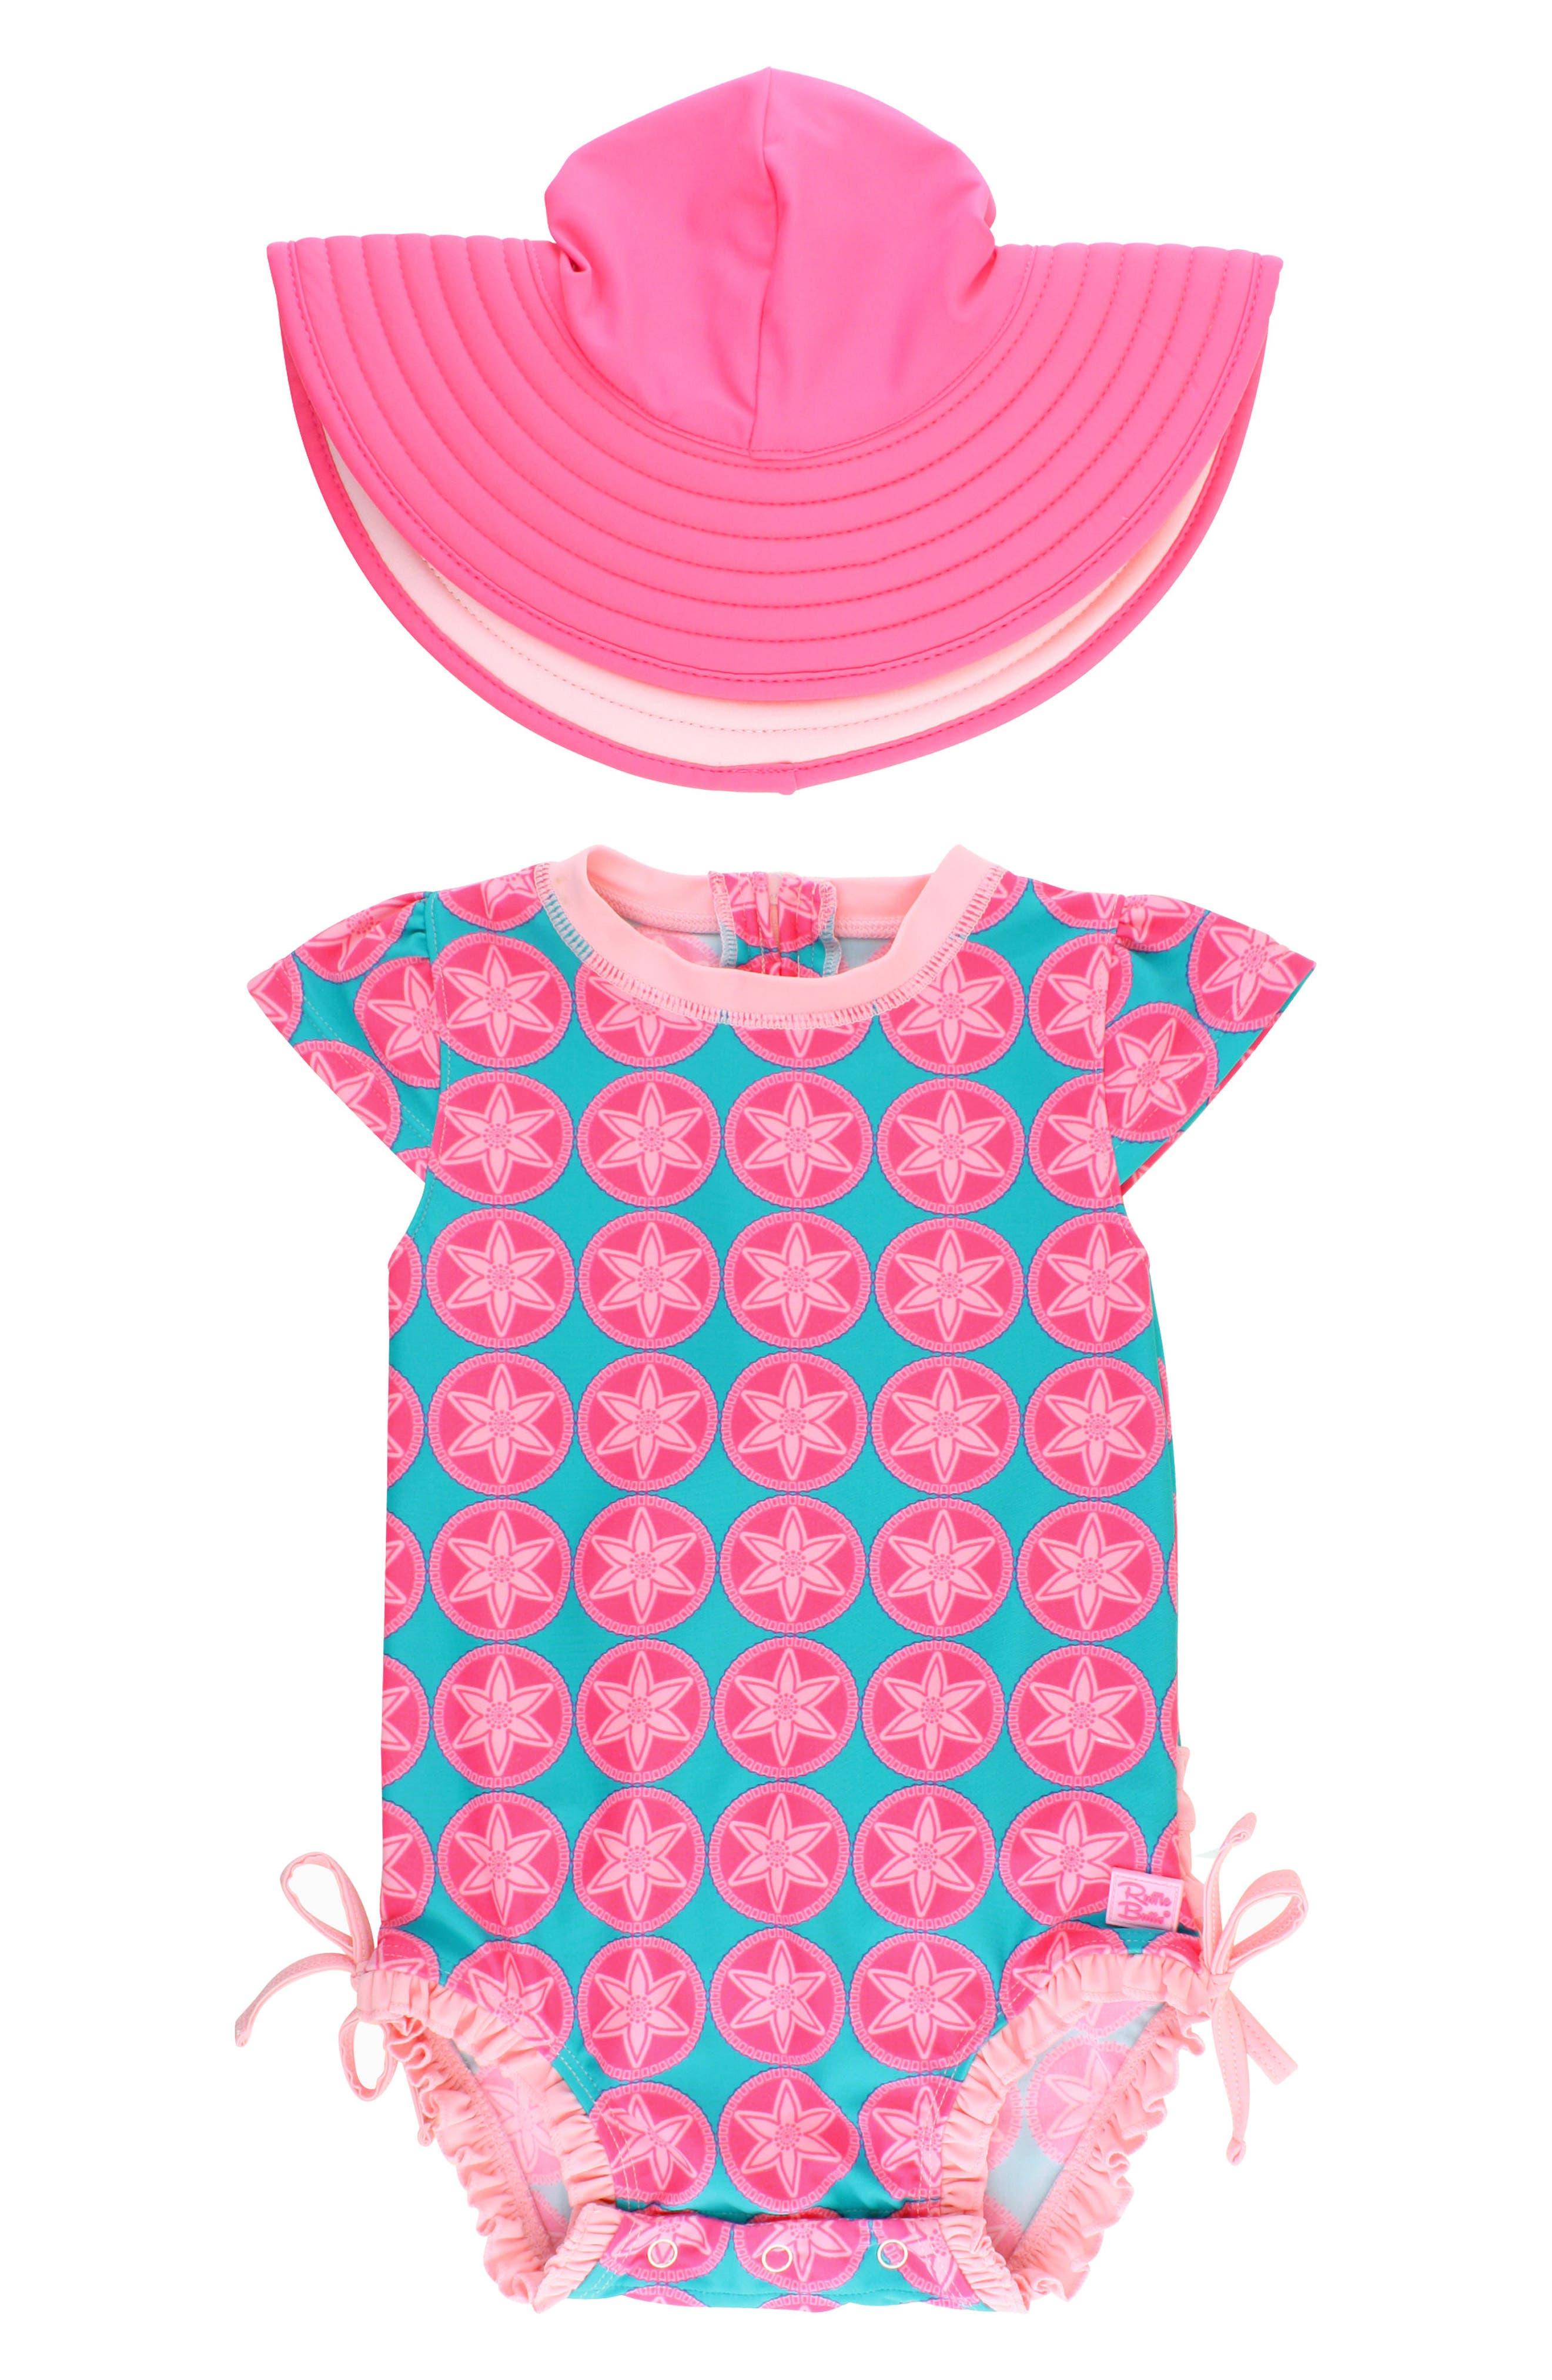 Alternate Image 1 Selected - RuffleButts Salt Water Taffy One-Piece Swimsuit & Hat Set (Baby Girls)